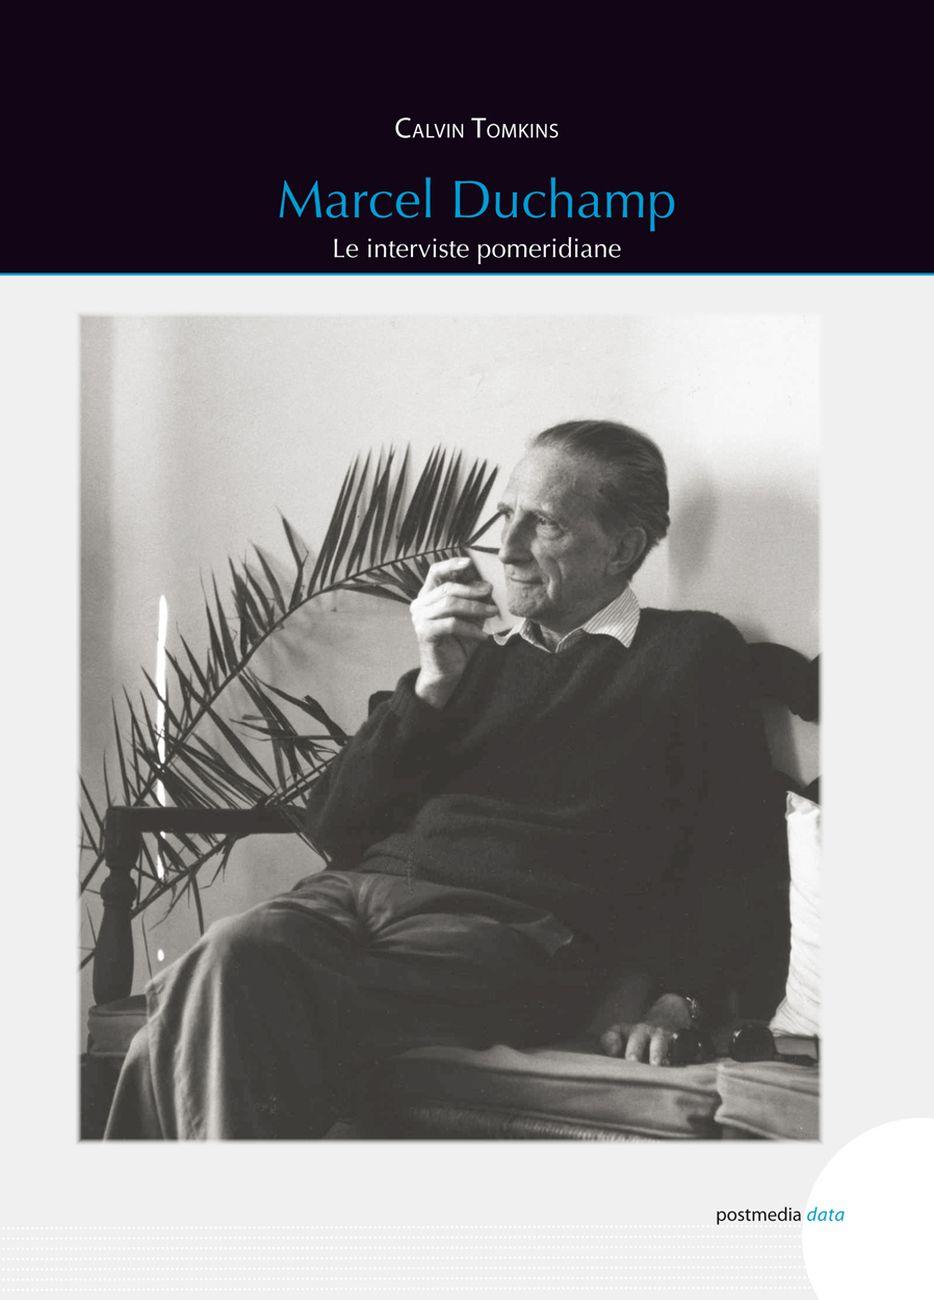 Calvin Tomkins ‒ Marcel Duchamp (Postmedia Books, Milano 2020)